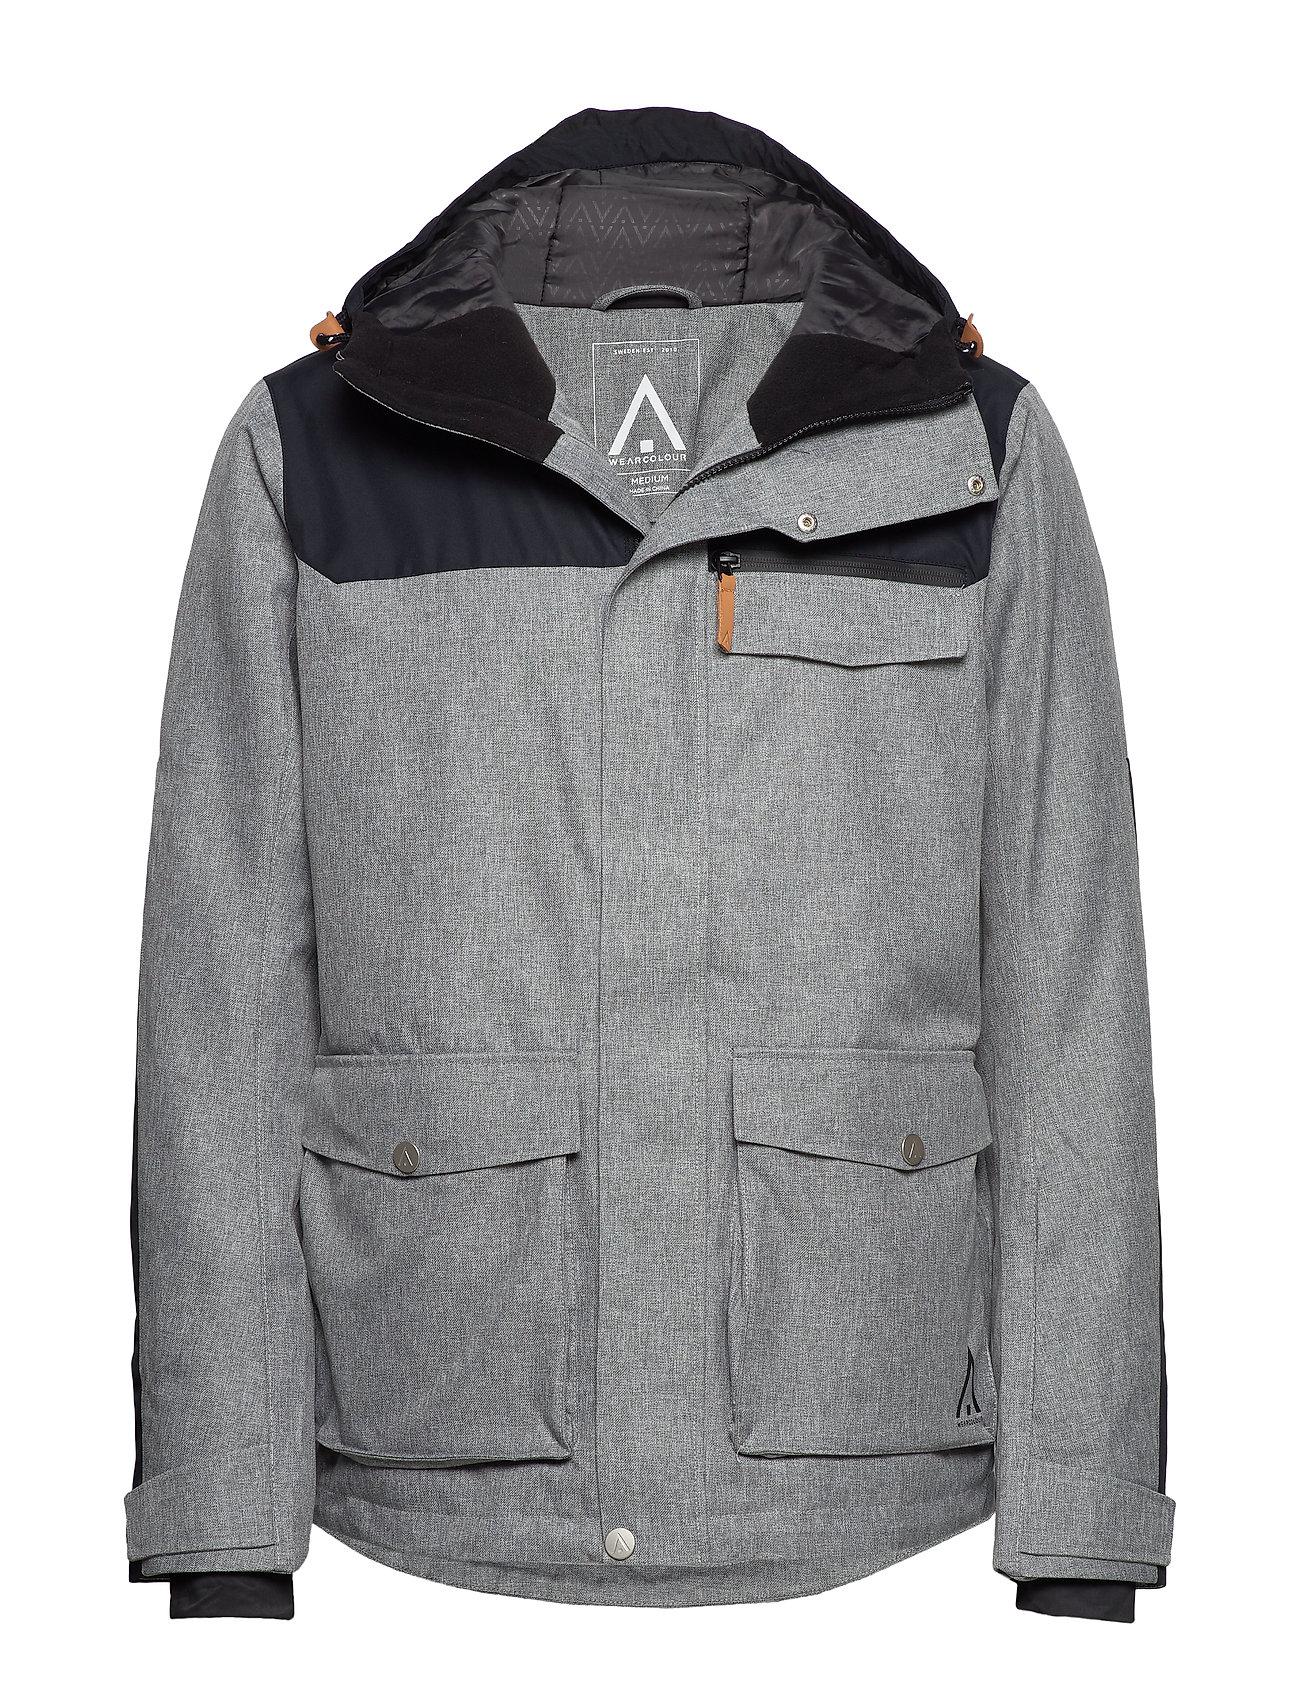 WearColour ROAM Jacket - GREY MELANGE